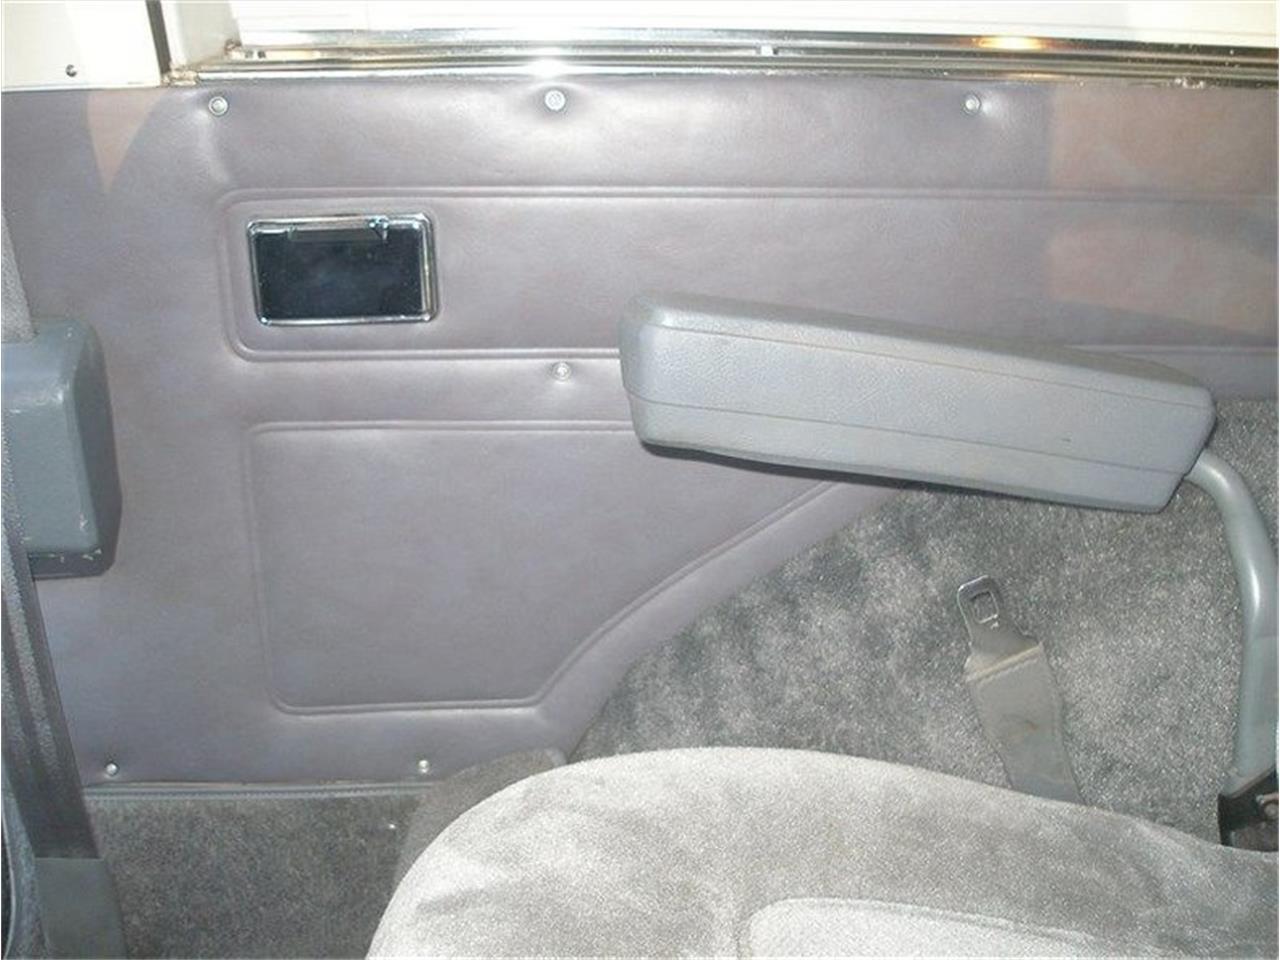 1987 Chevrolet Blazer (CC-1421594) for sale in Punta Gorda, Florida